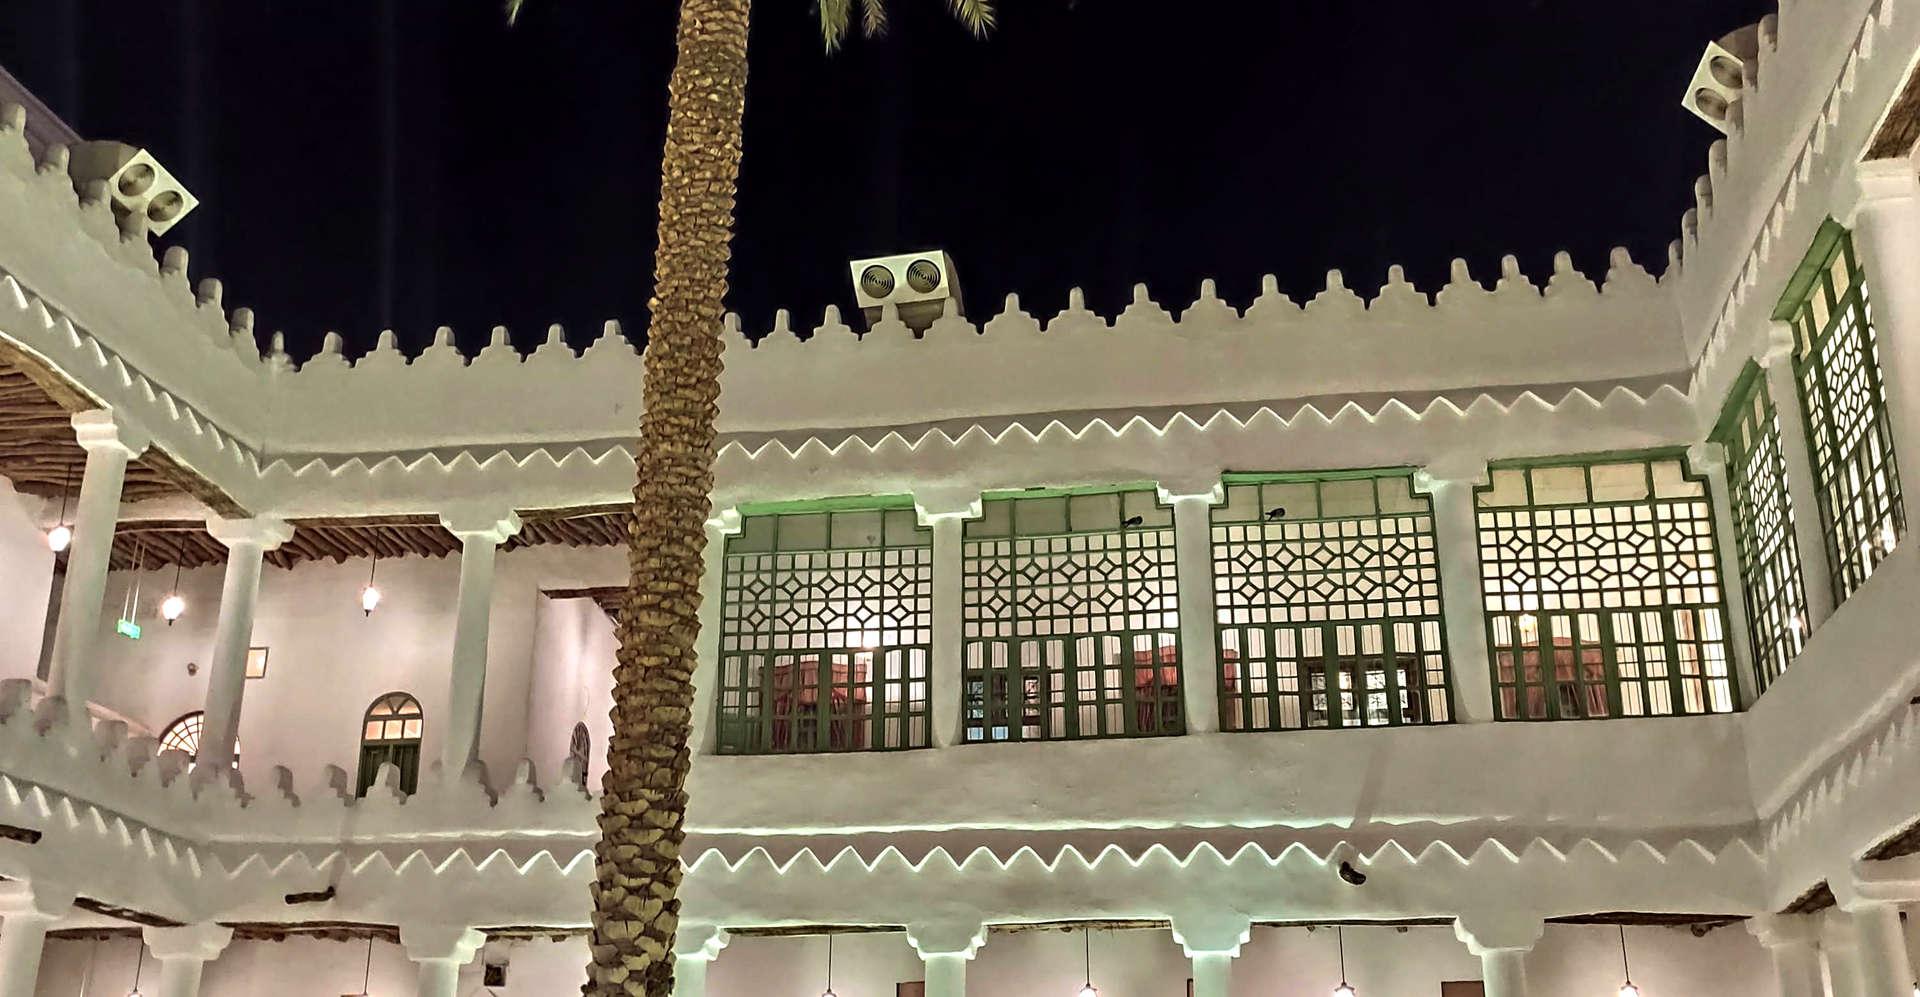 Saudia Arabia PAGANE uniques (3).jpg